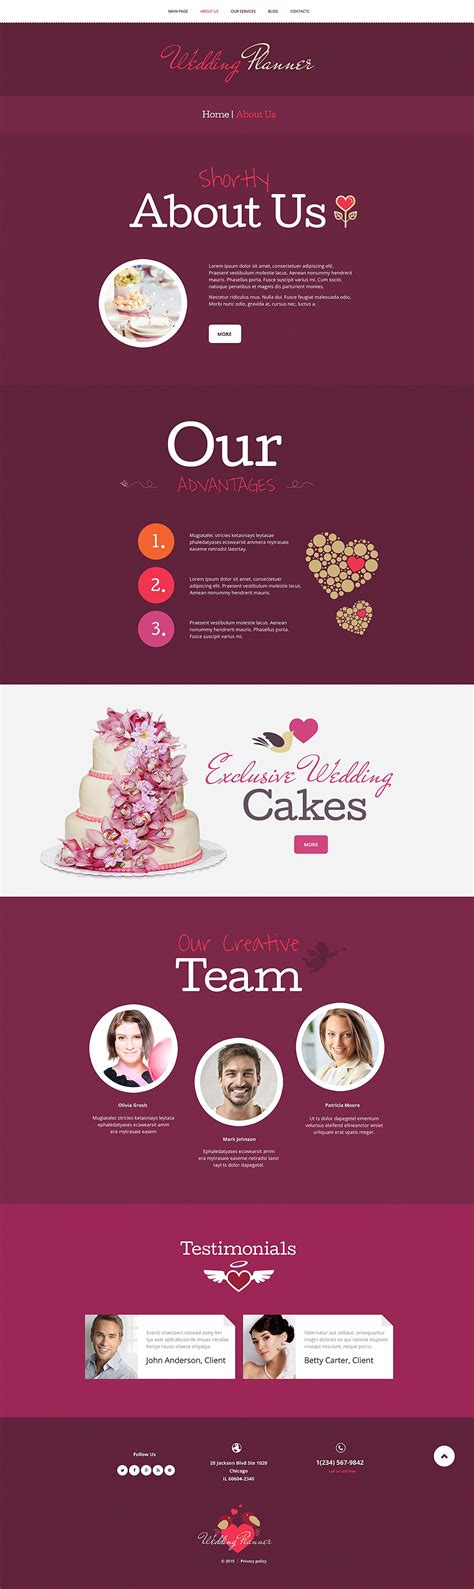 Wedding Planner Theme by 30 Best Wedding Themes